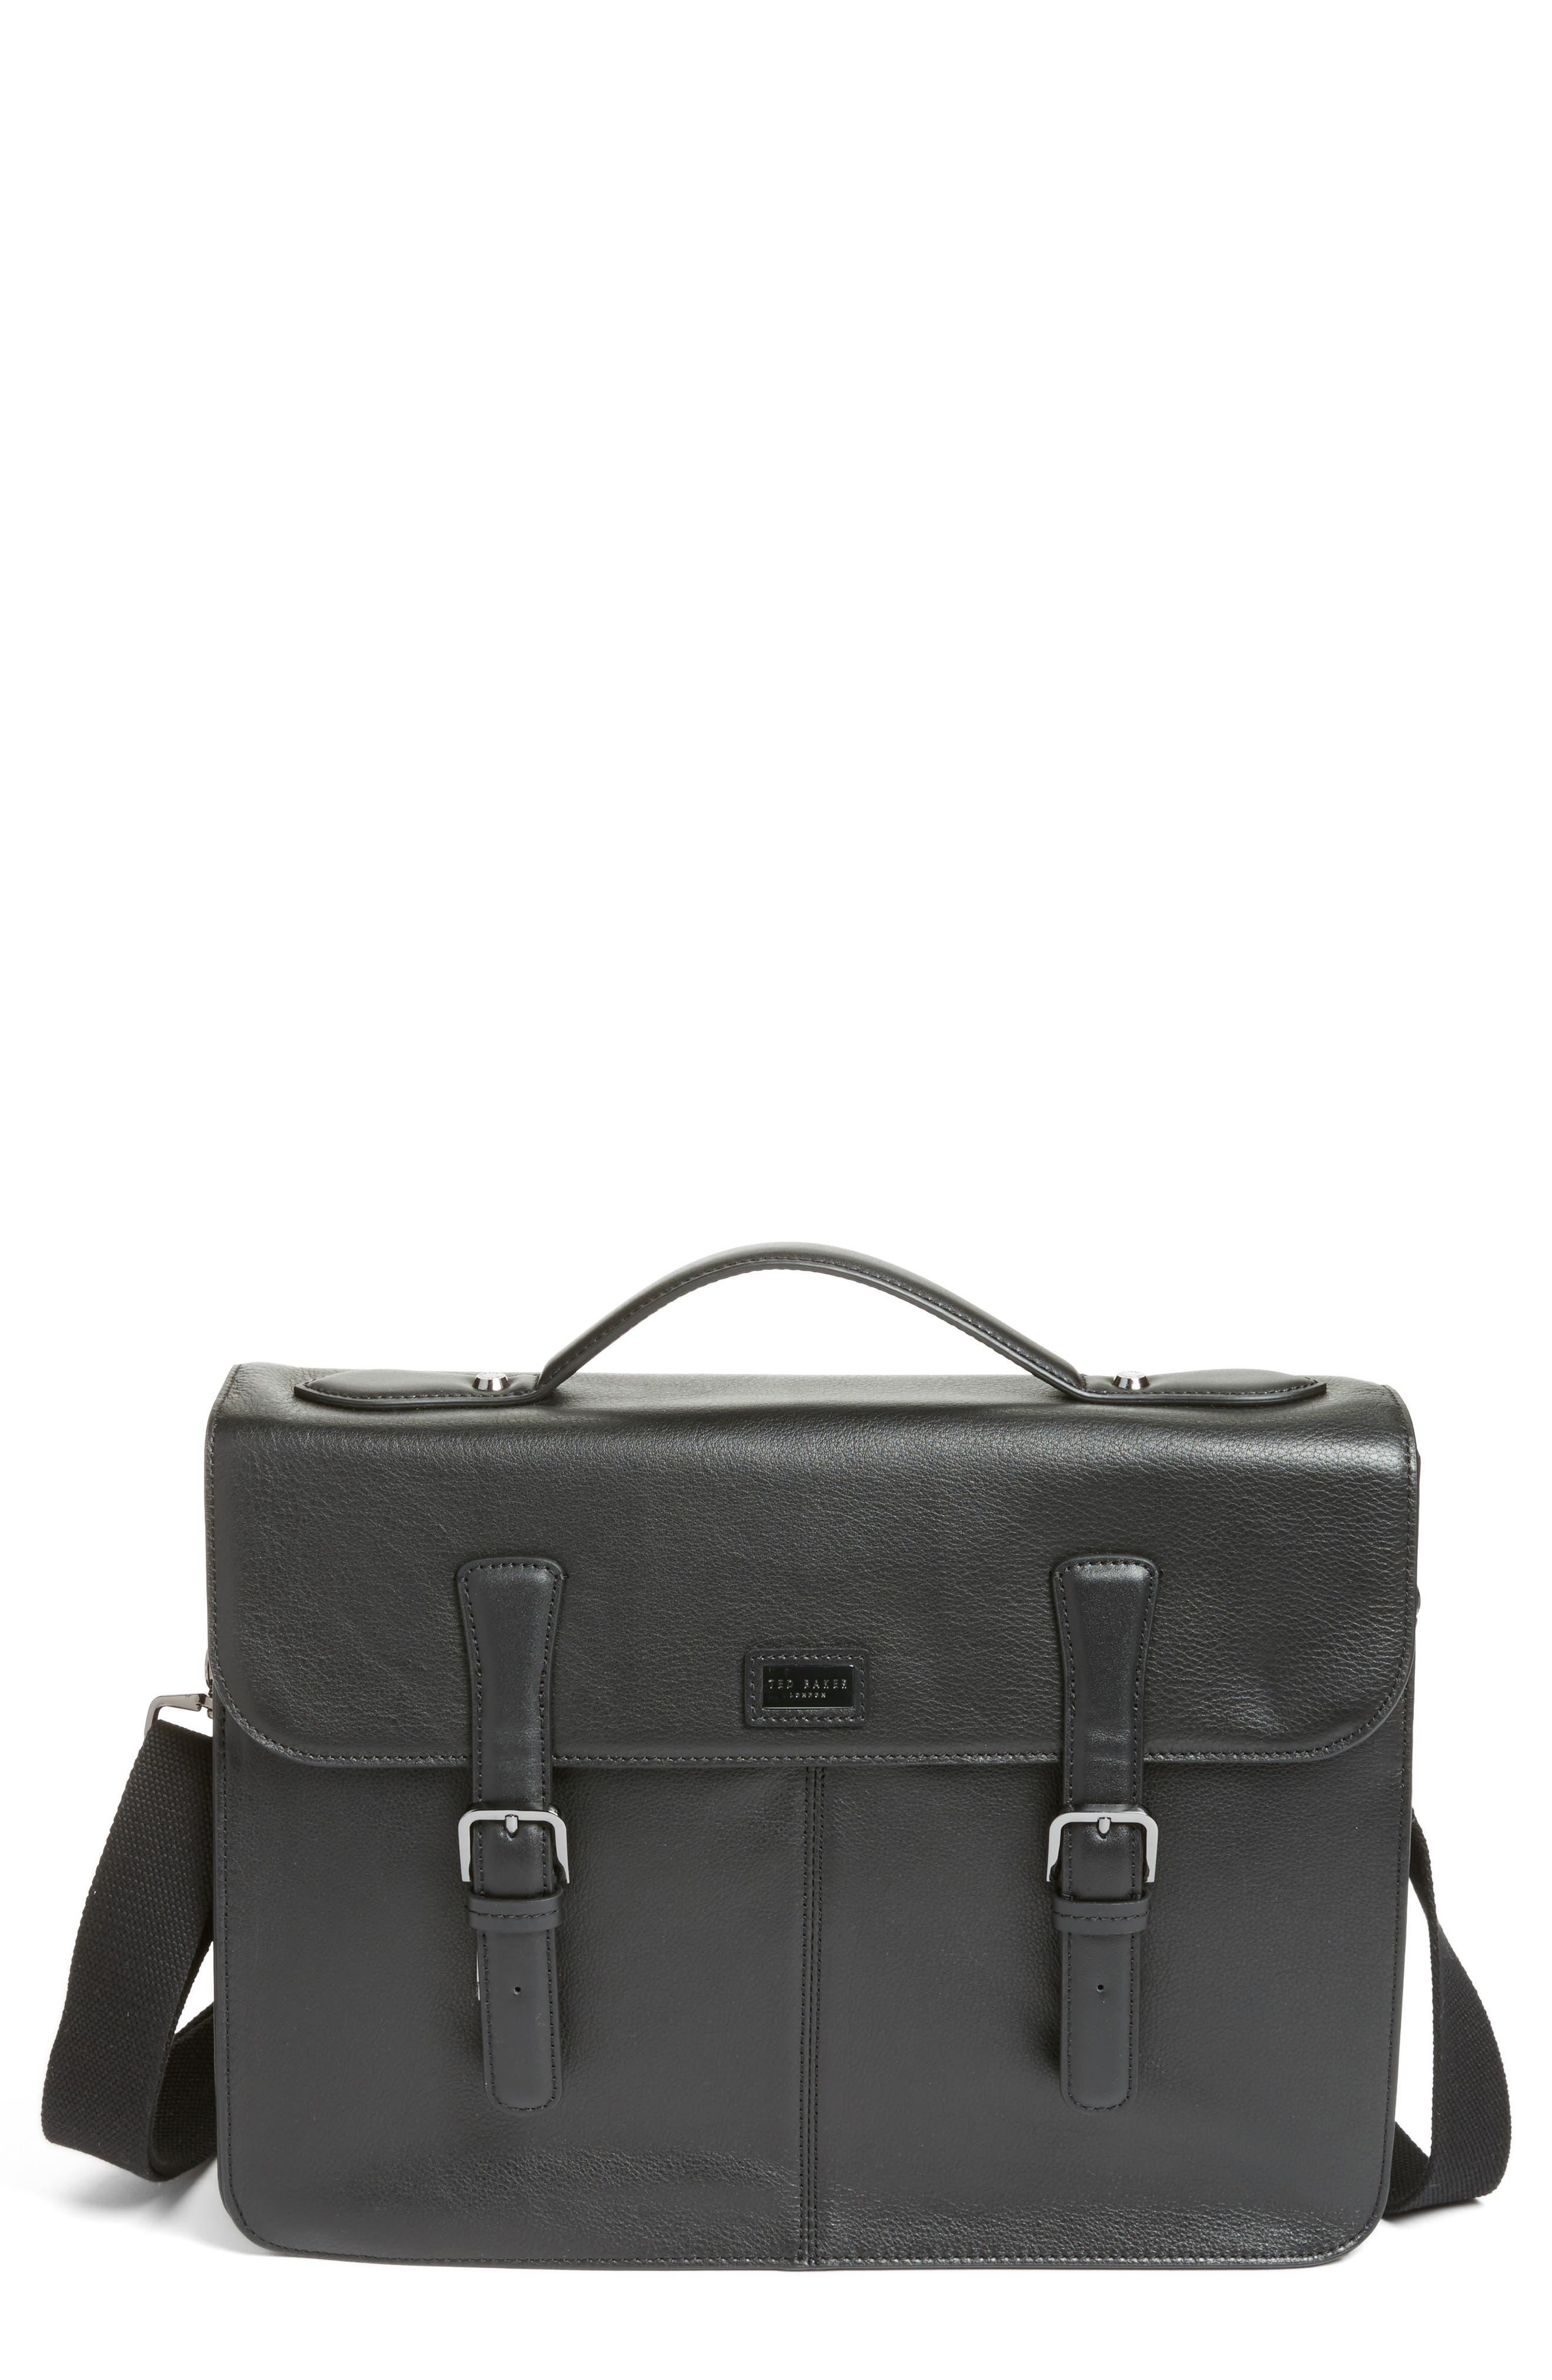 Bengal Leather Satchel,                         Main,                         color, 001